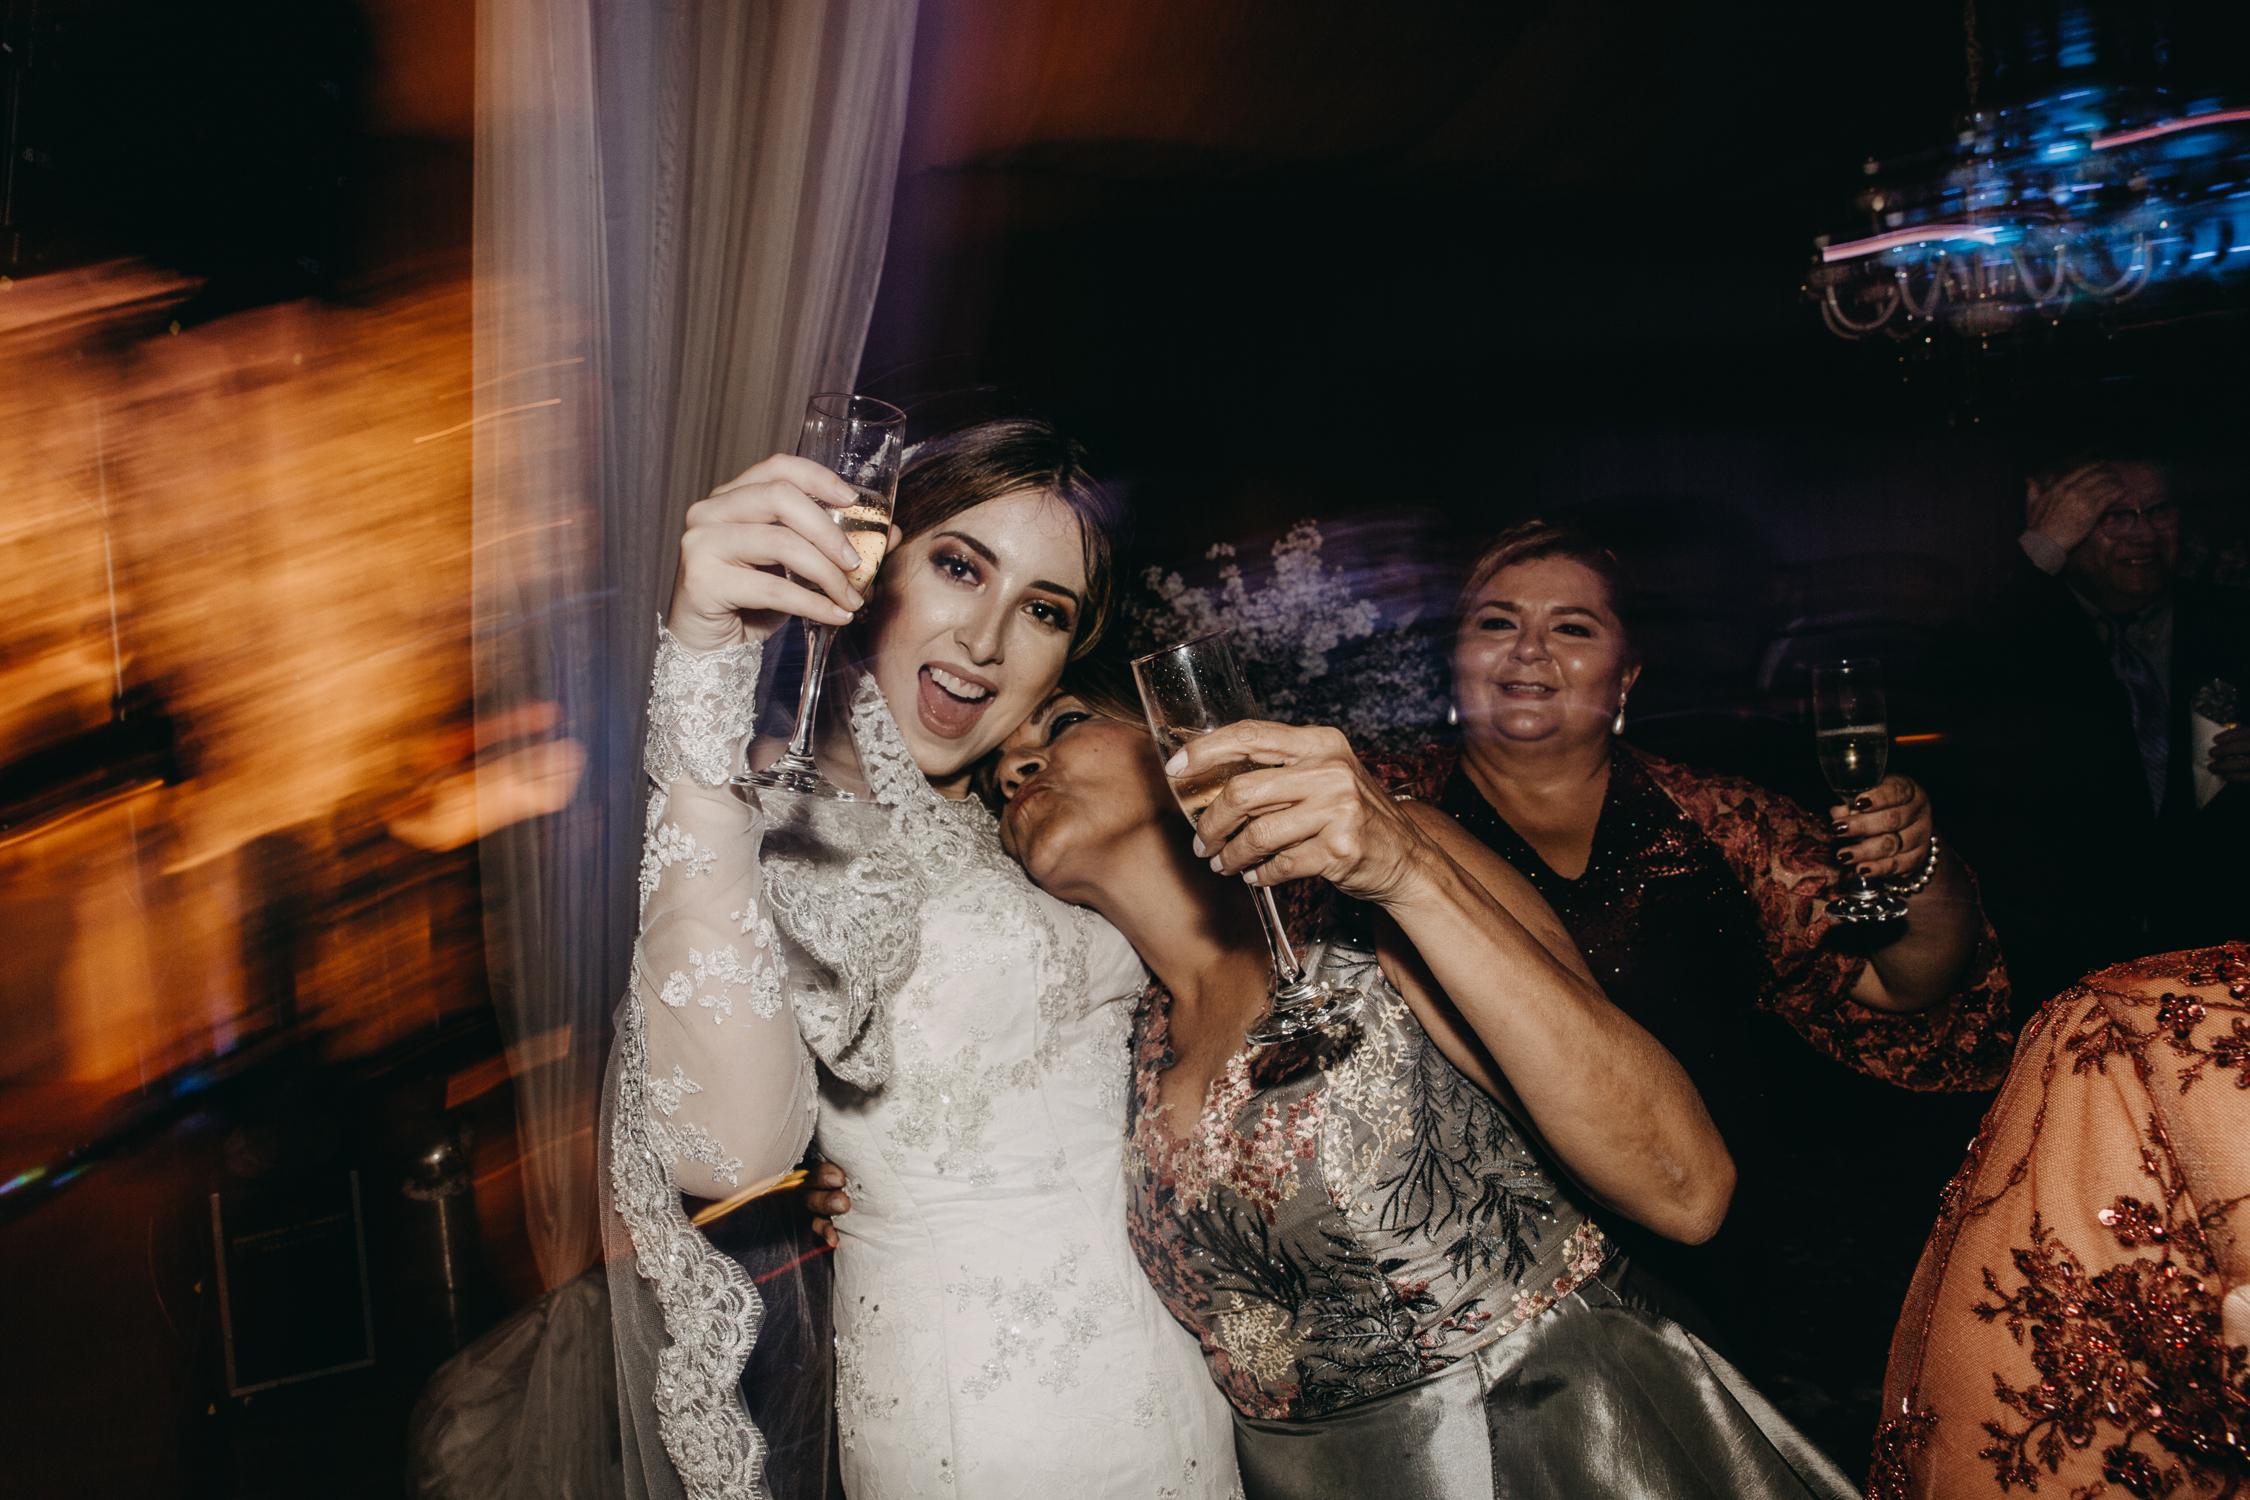 Michelle-Agurto-Fotografia-Bodas-Ecuador-Destination-Wedding-Photographer-Vicky-Javier-223.JPG